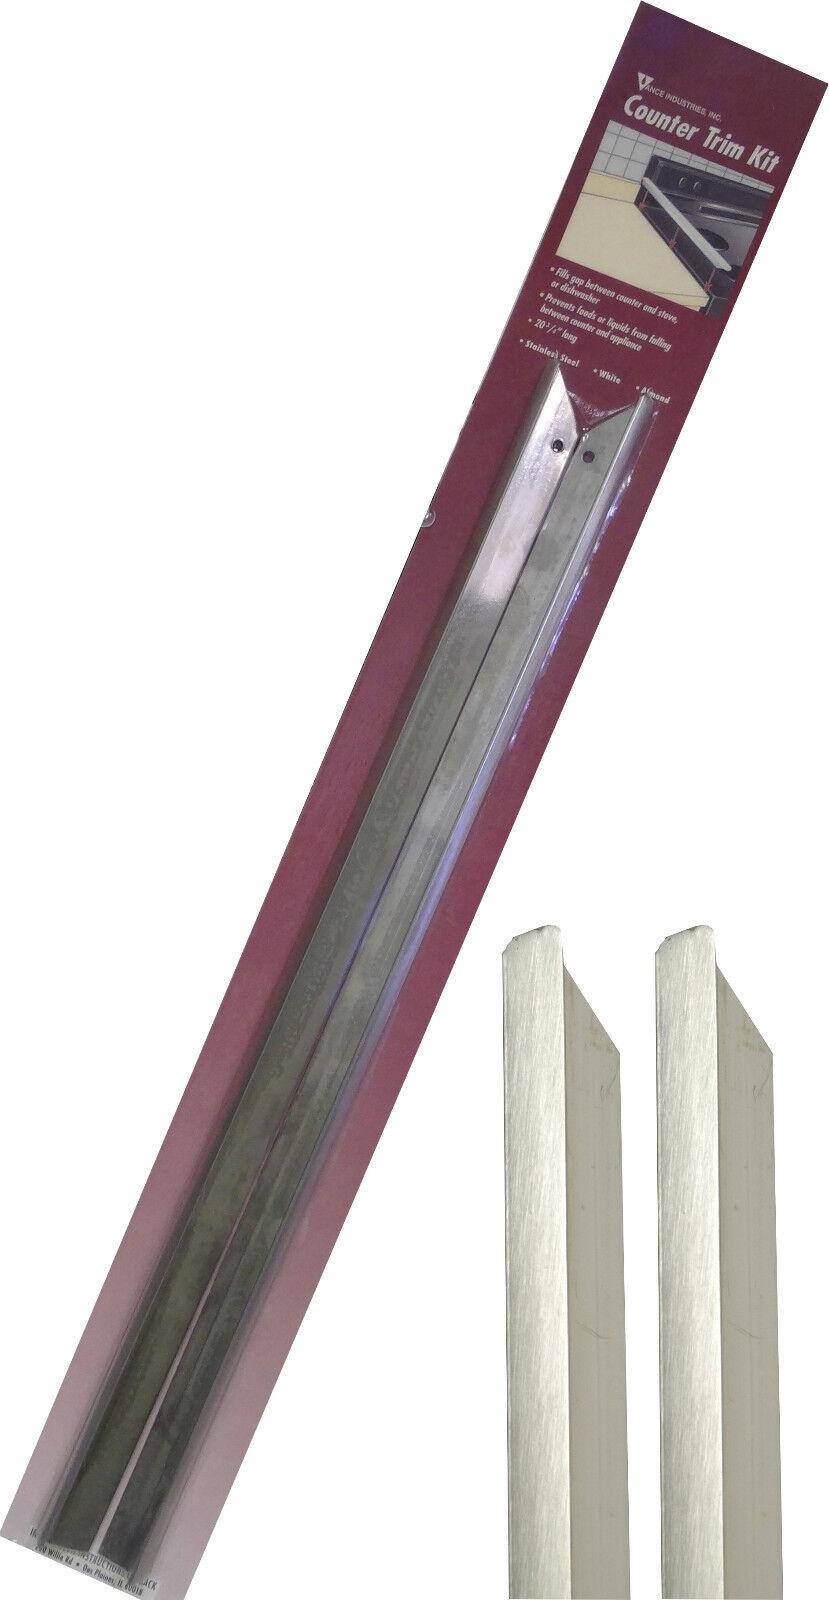 Vance Long Stainless Steel Counter Trim Kit for Backless/Slide-in Stoves, 23-3/4